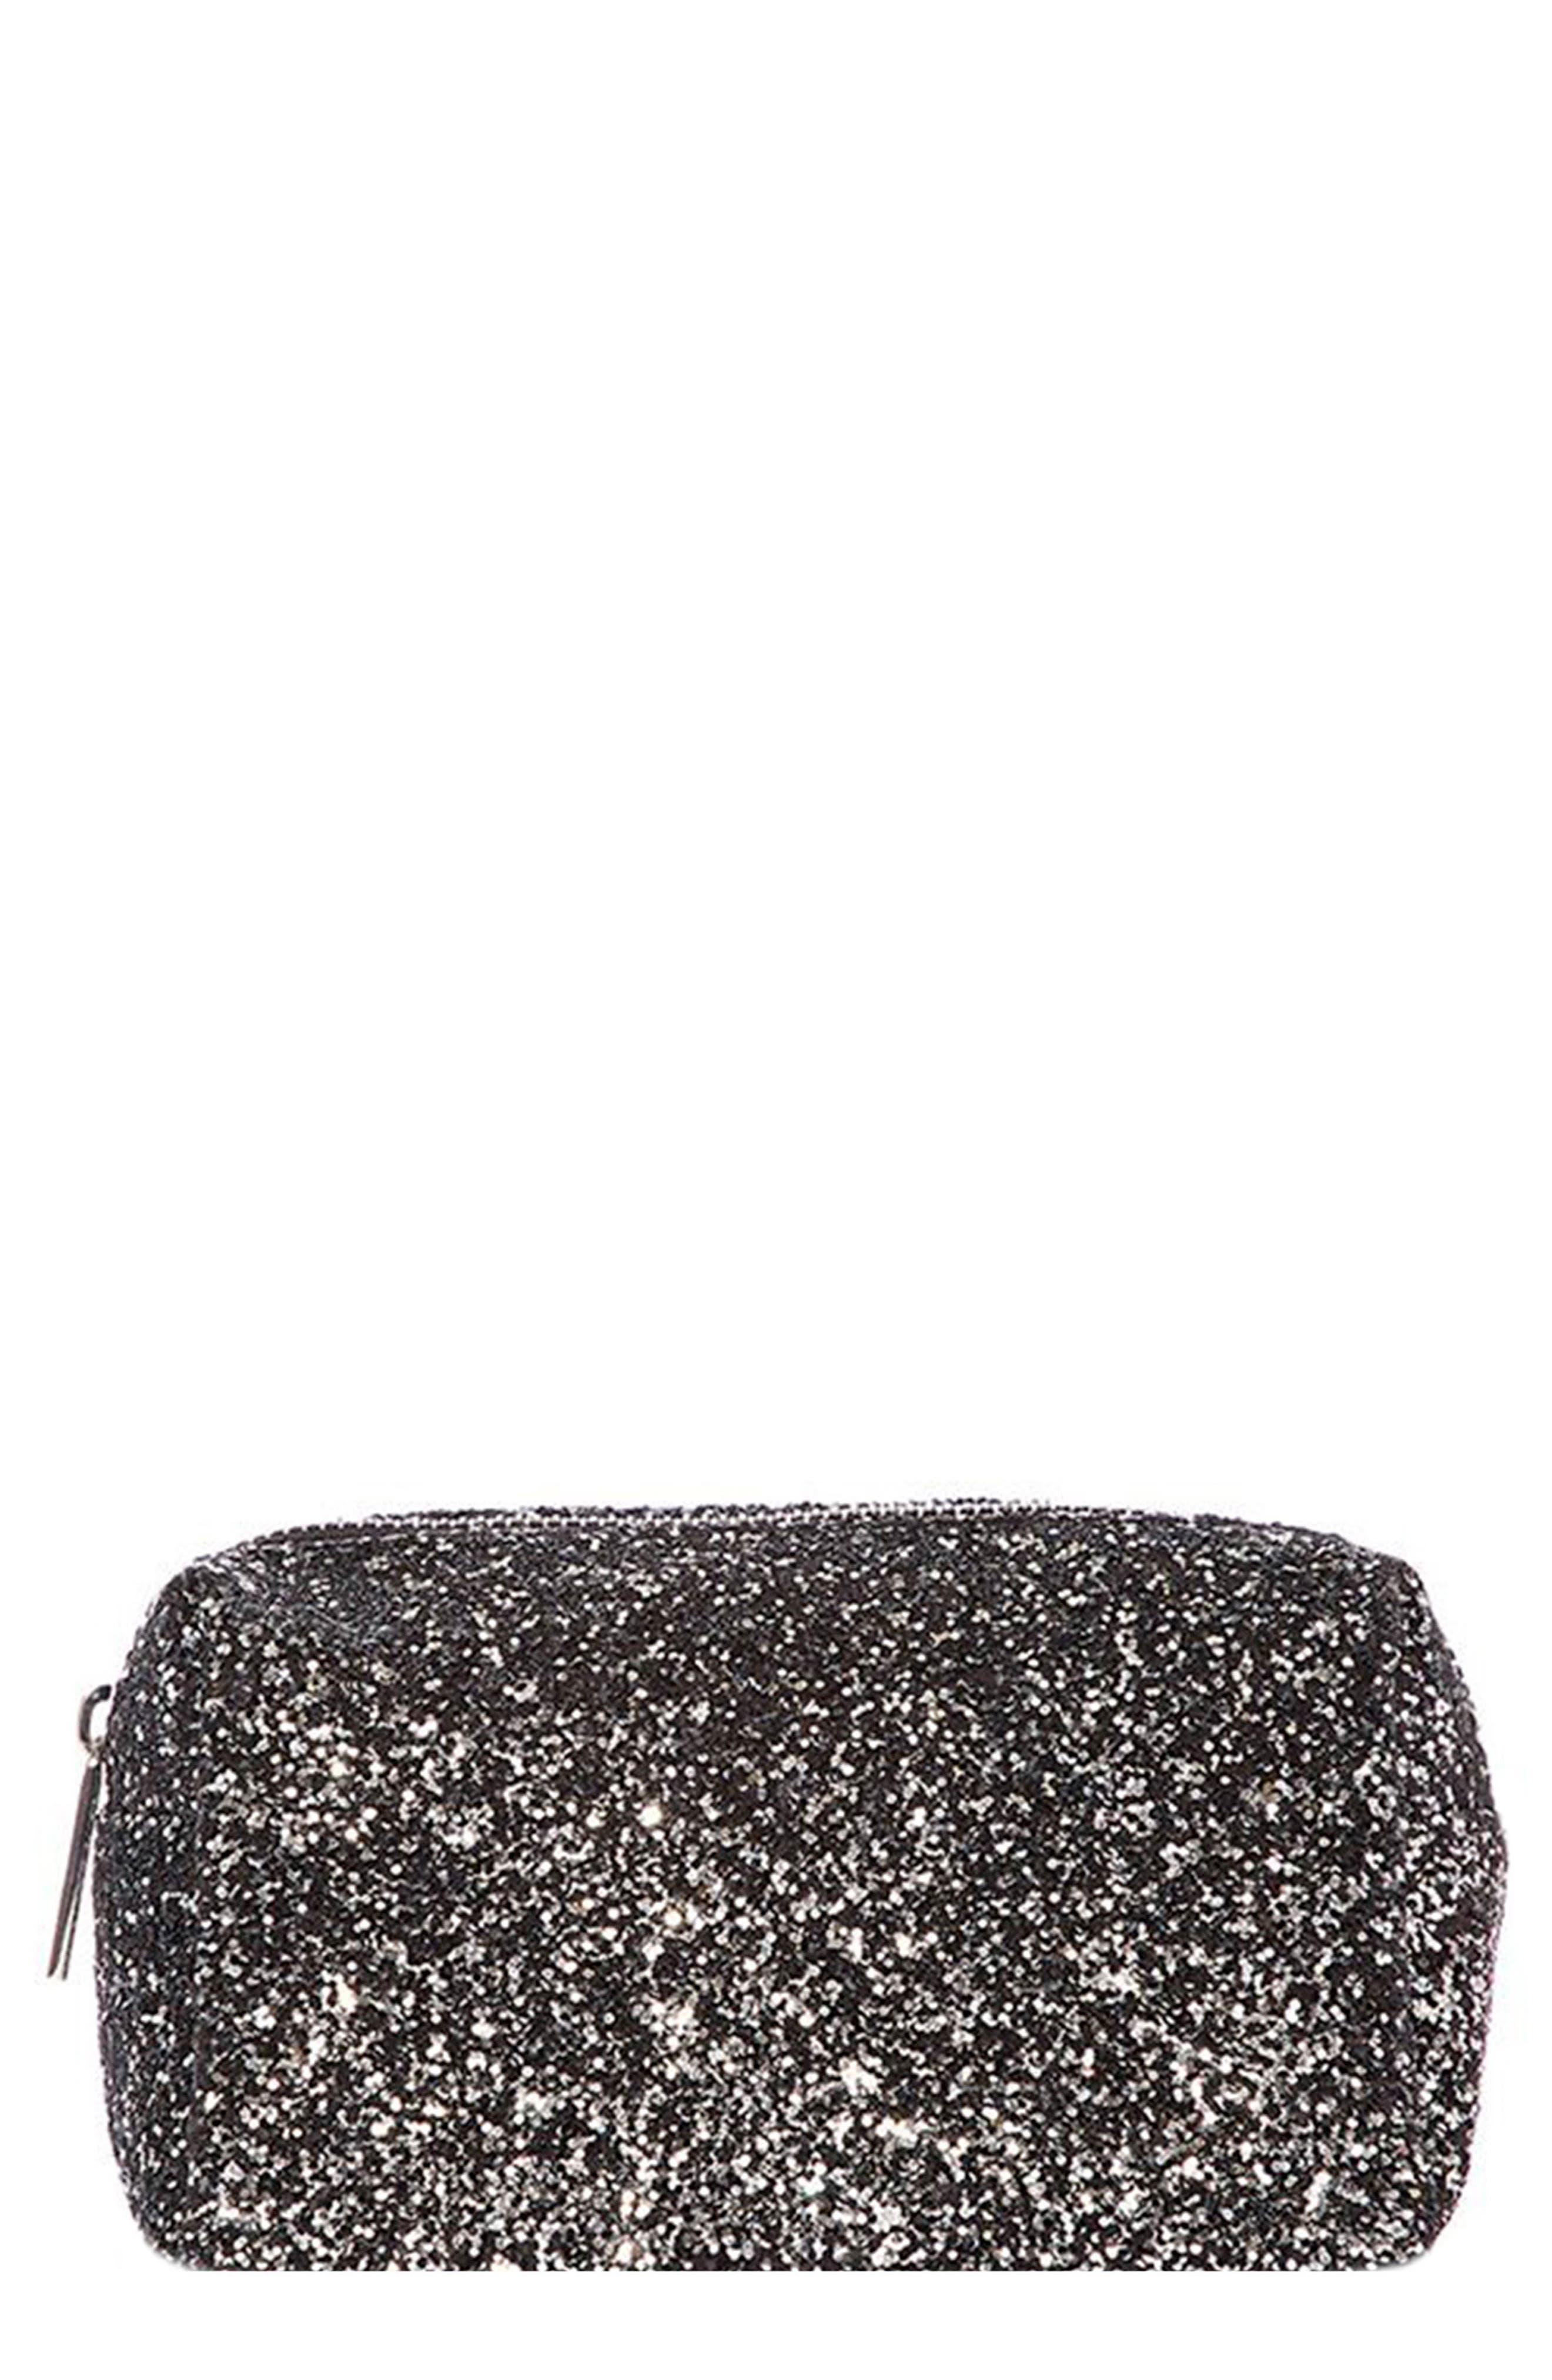 Skinny Dip Midnight Makeup Bag,                         Main,                         color, No Color